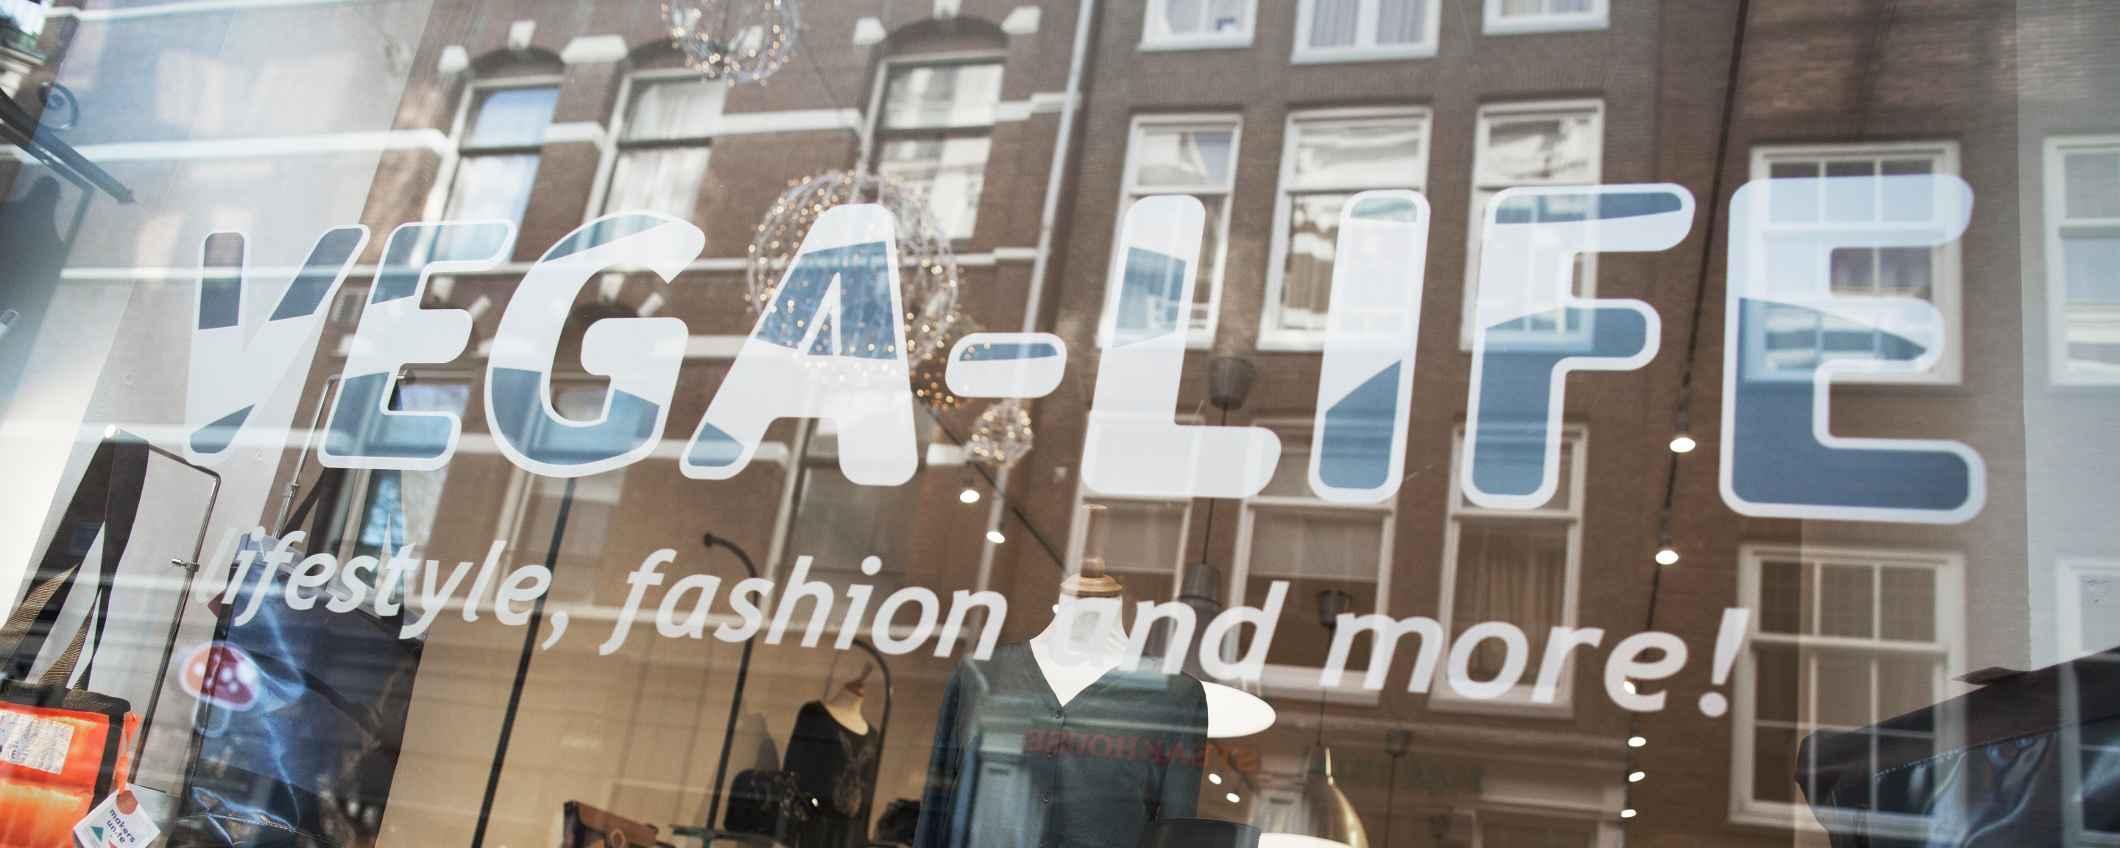 Veganistische lifestylewinkel Vega-Life in Amsterdam Triodos Bank